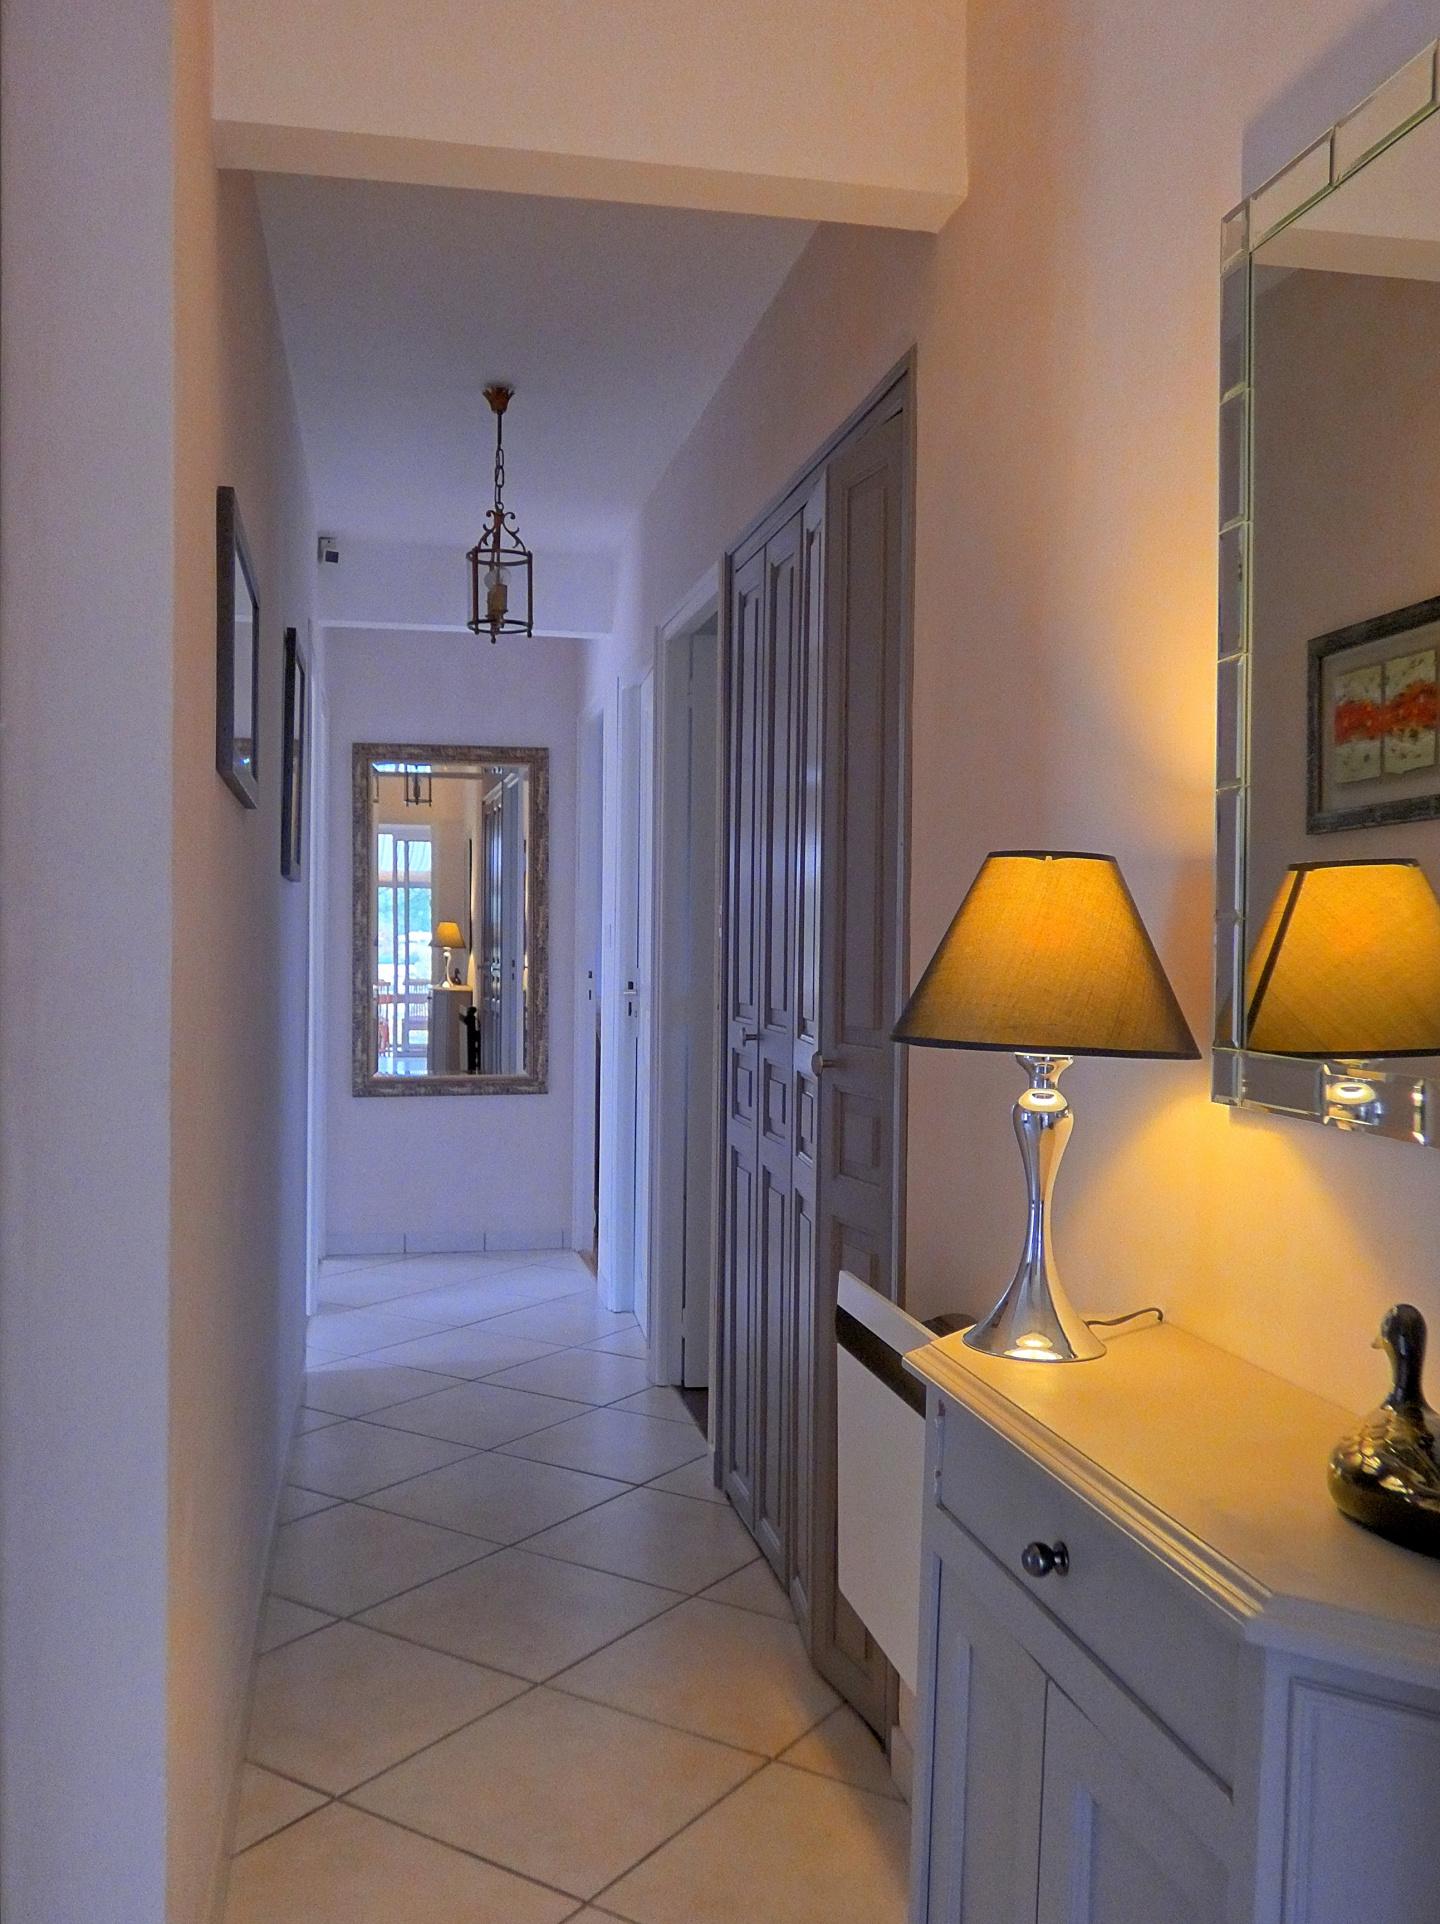 vente MAISON 5 CHAMBRES - 157 m² - PROCHE TOUTES COMMODITES